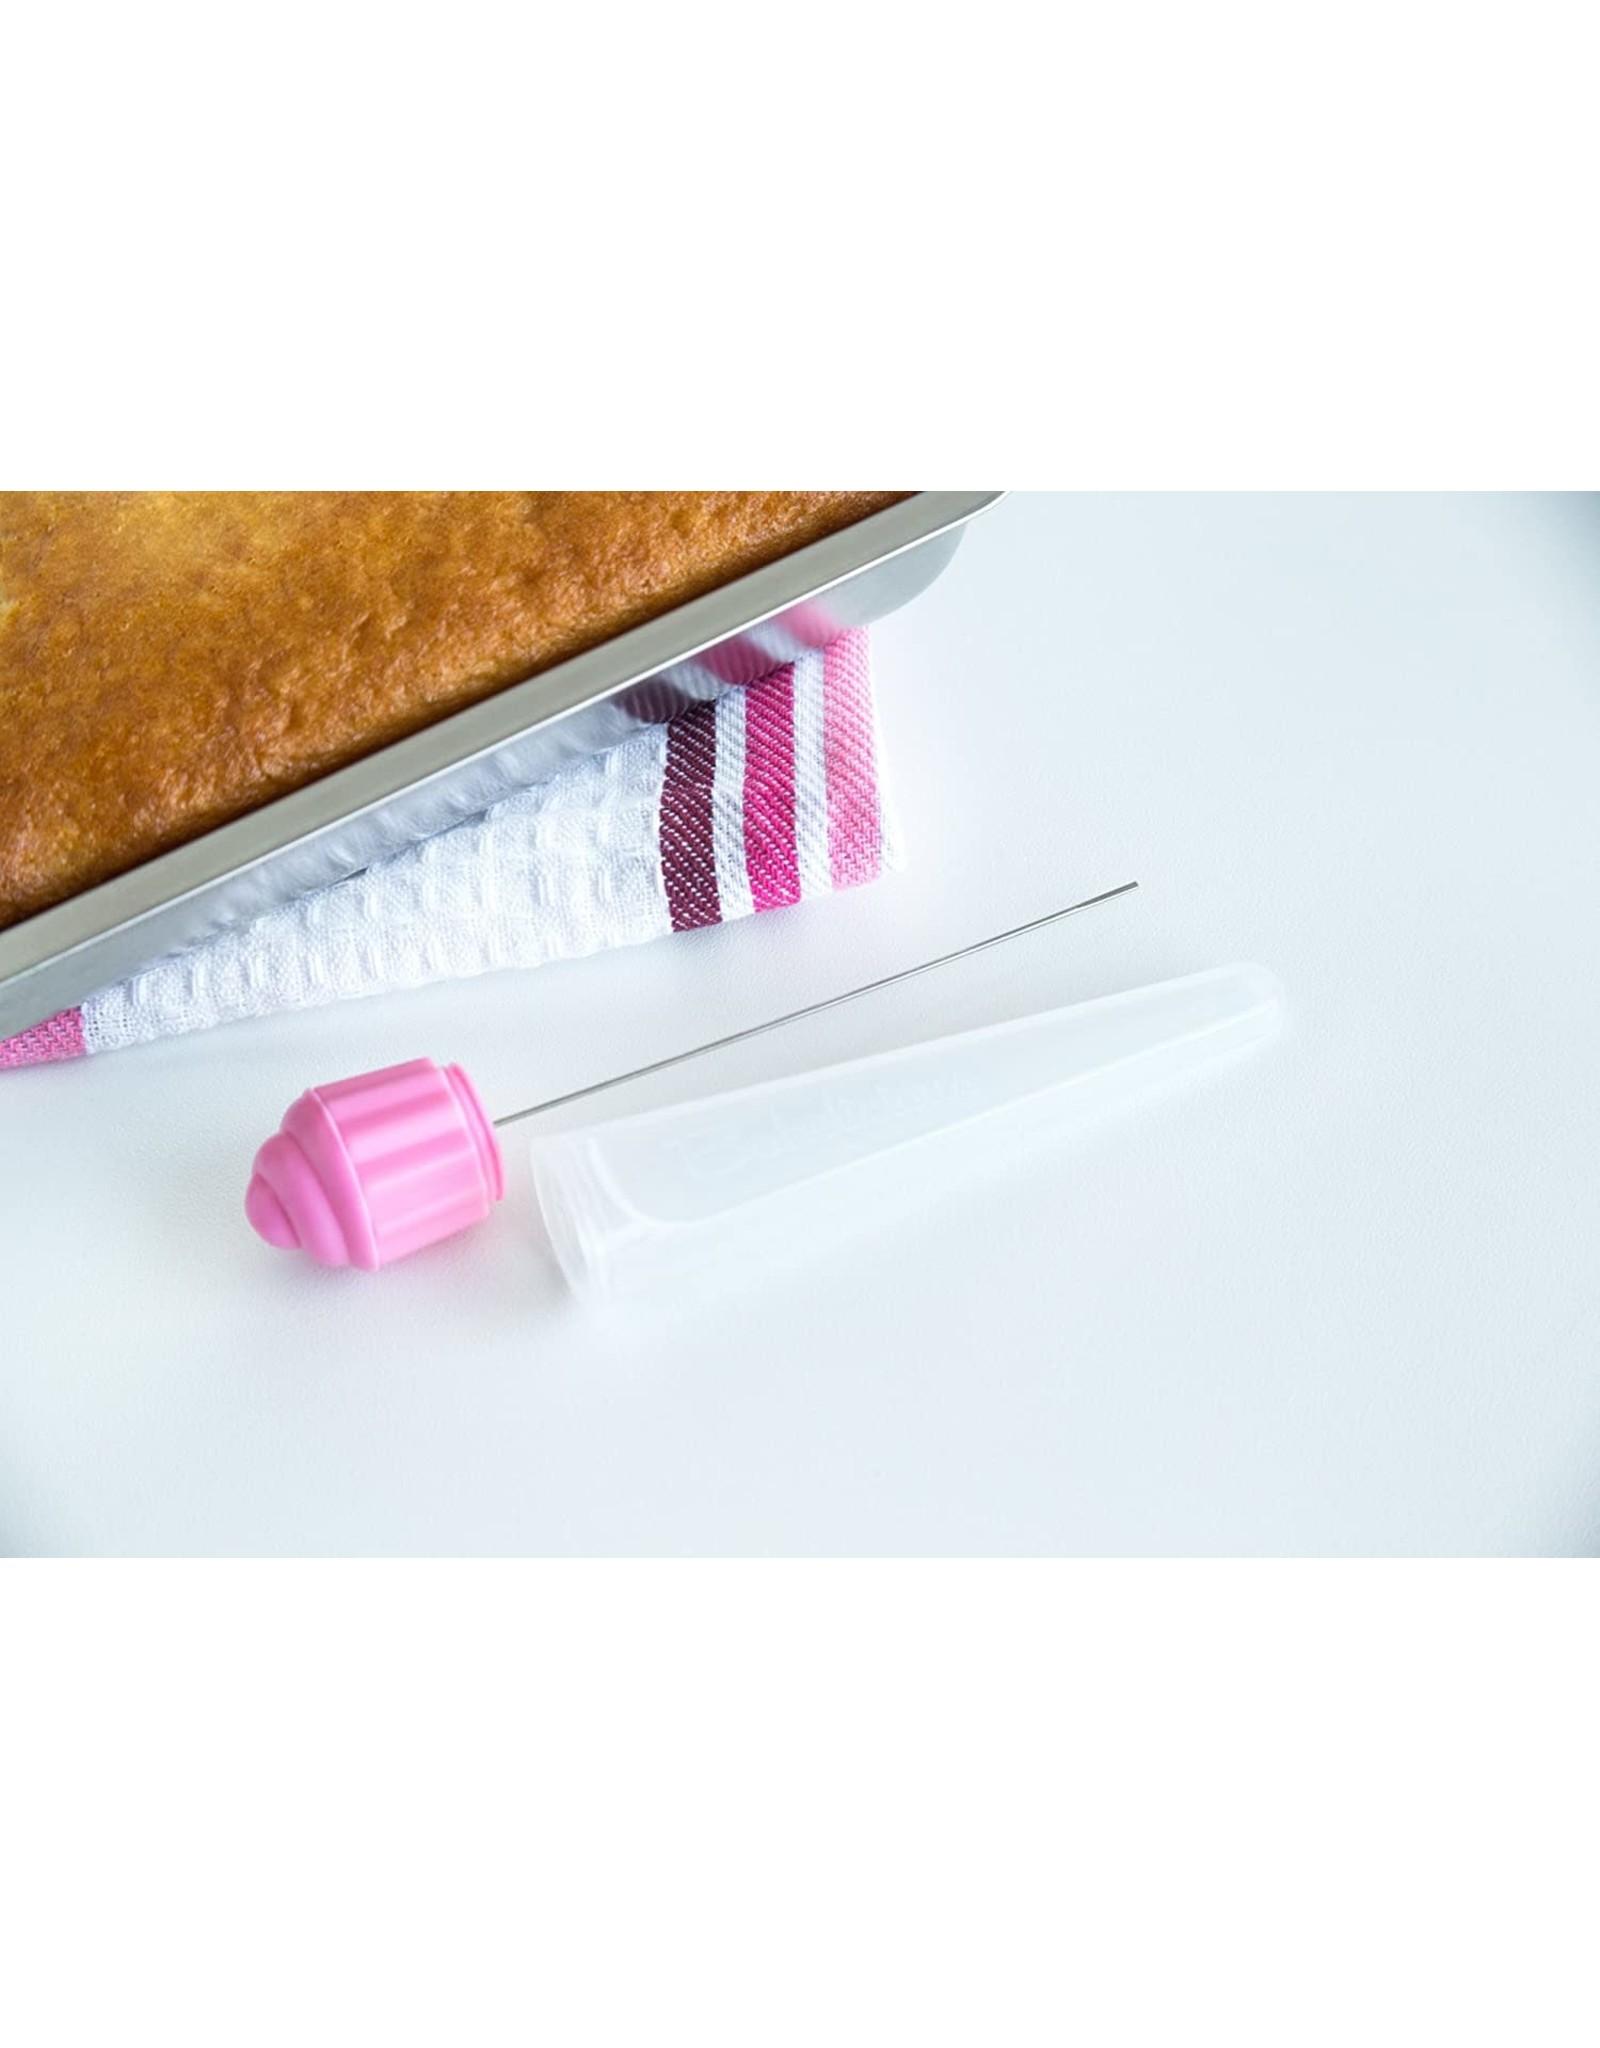 Fox Run BAKELICIOUS Cake Tester - 2 pc.